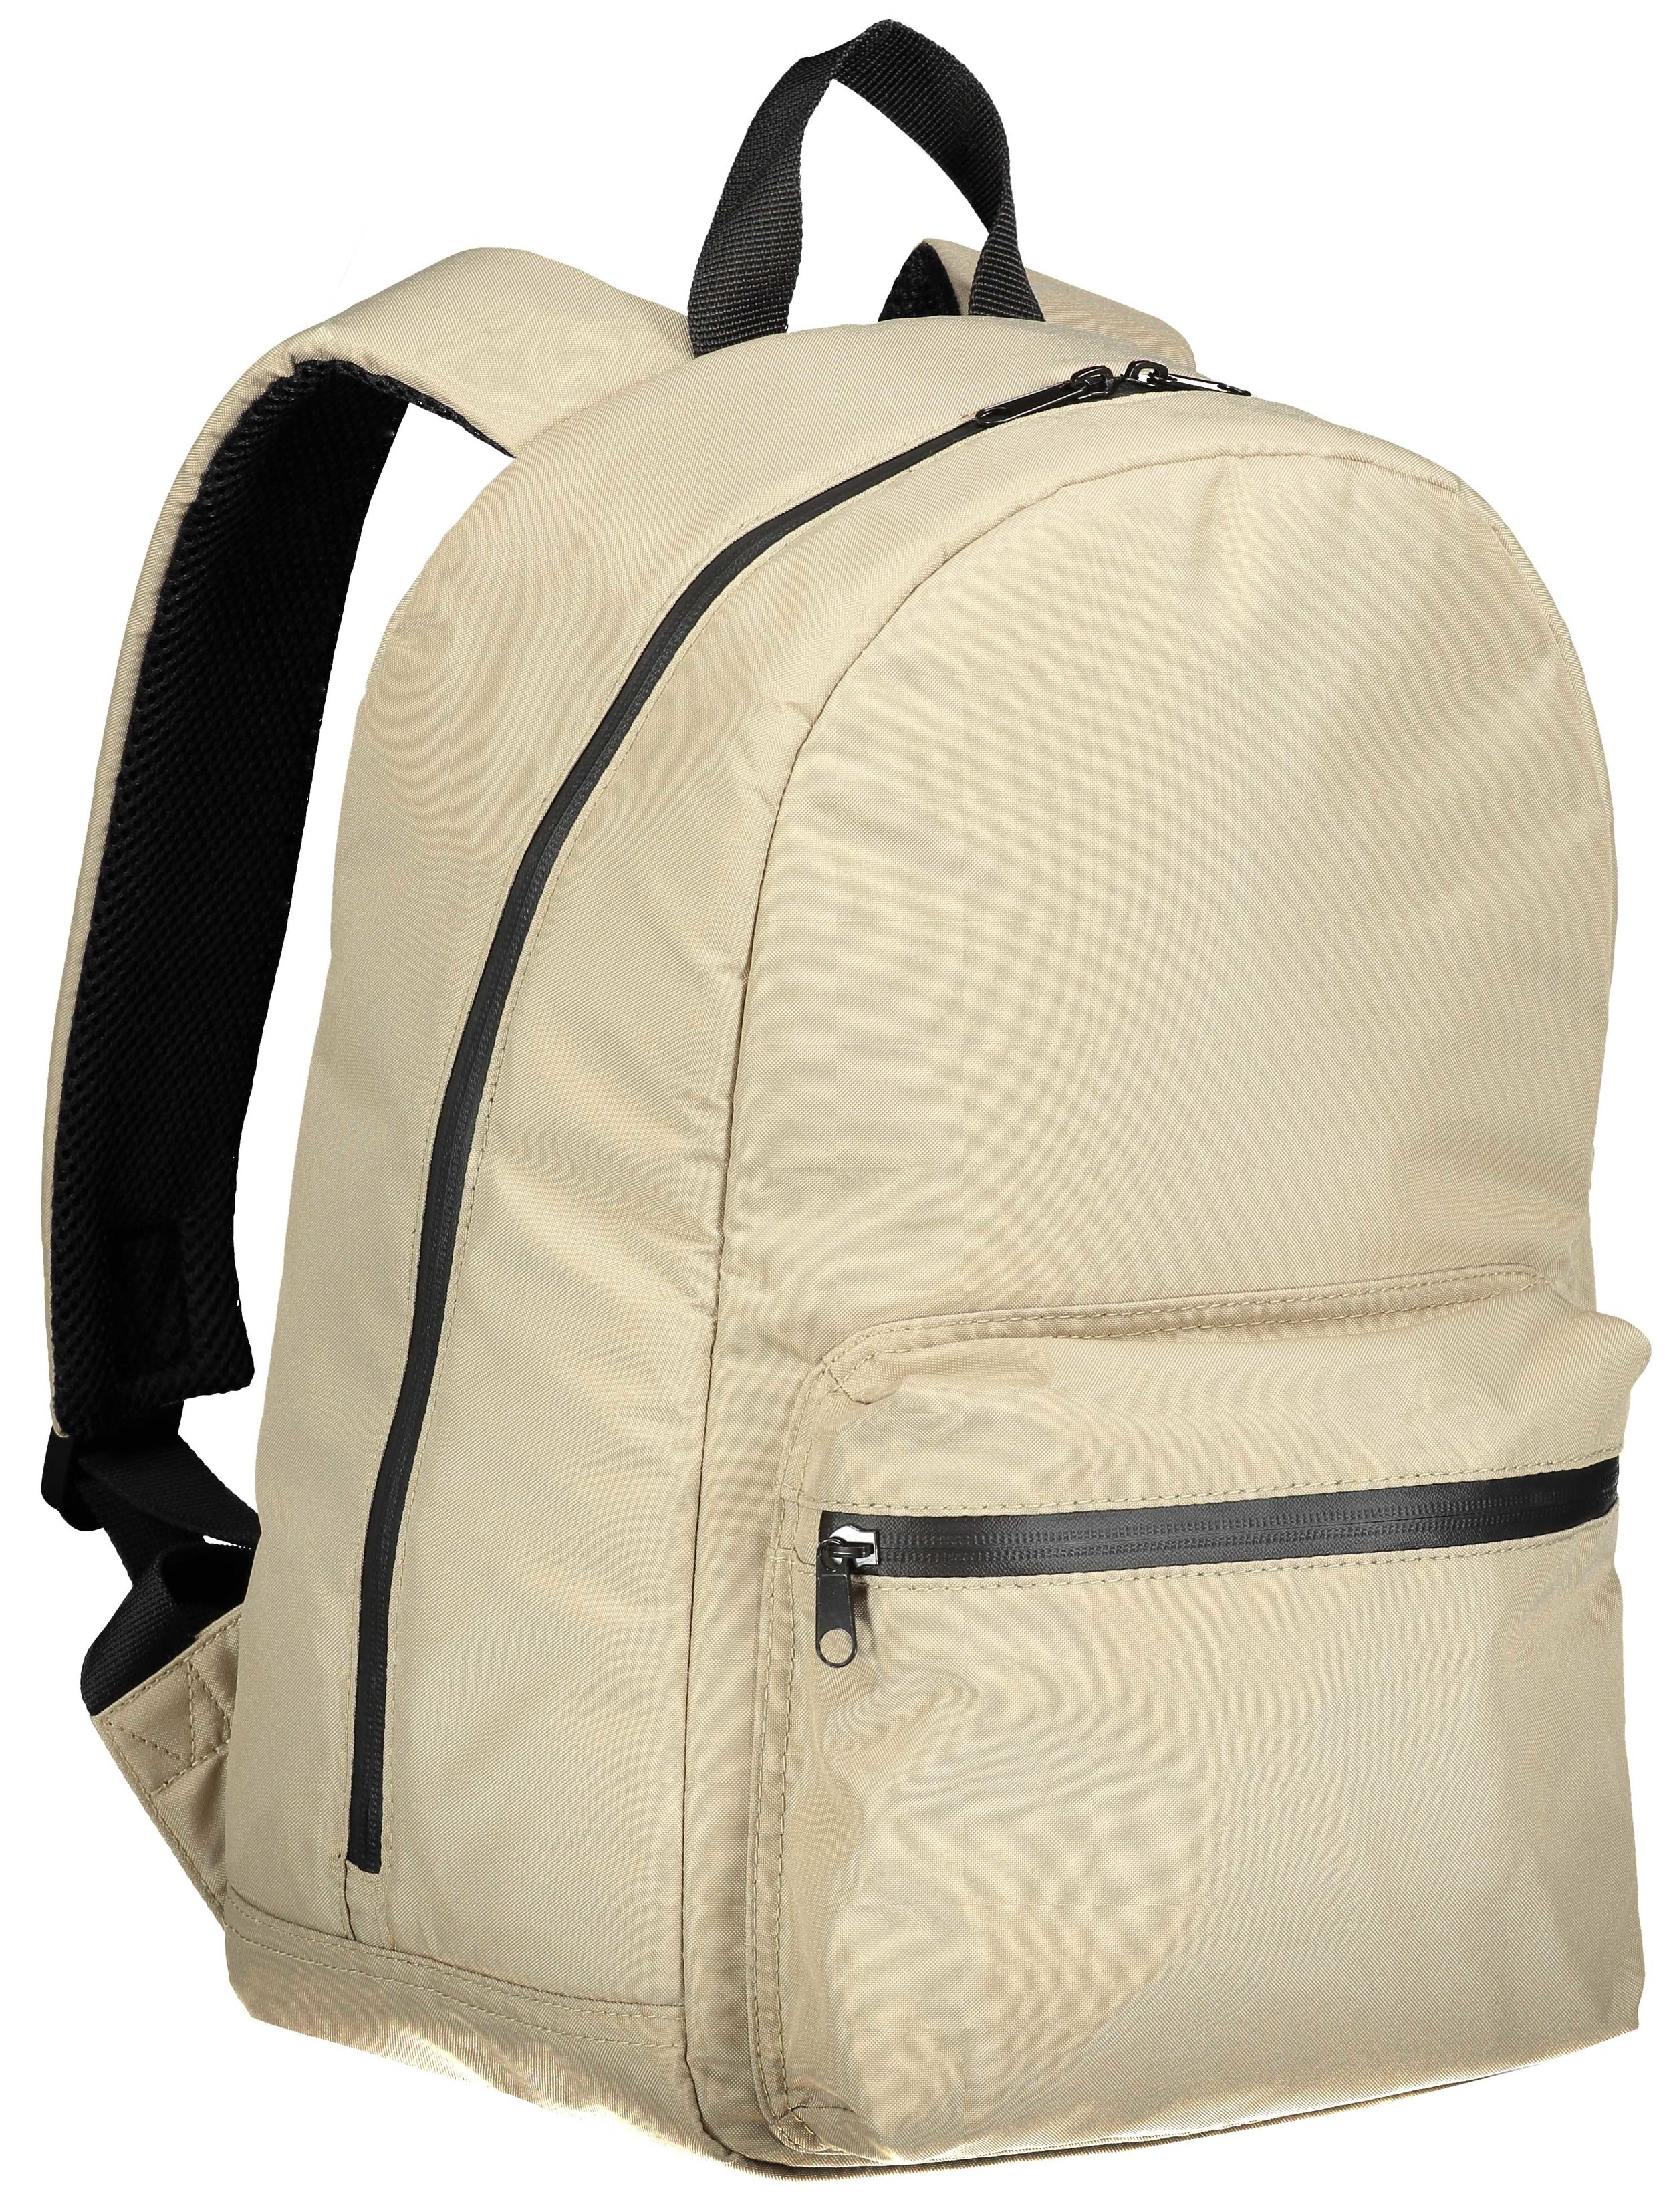 rucksack-_Front-updated.jpg